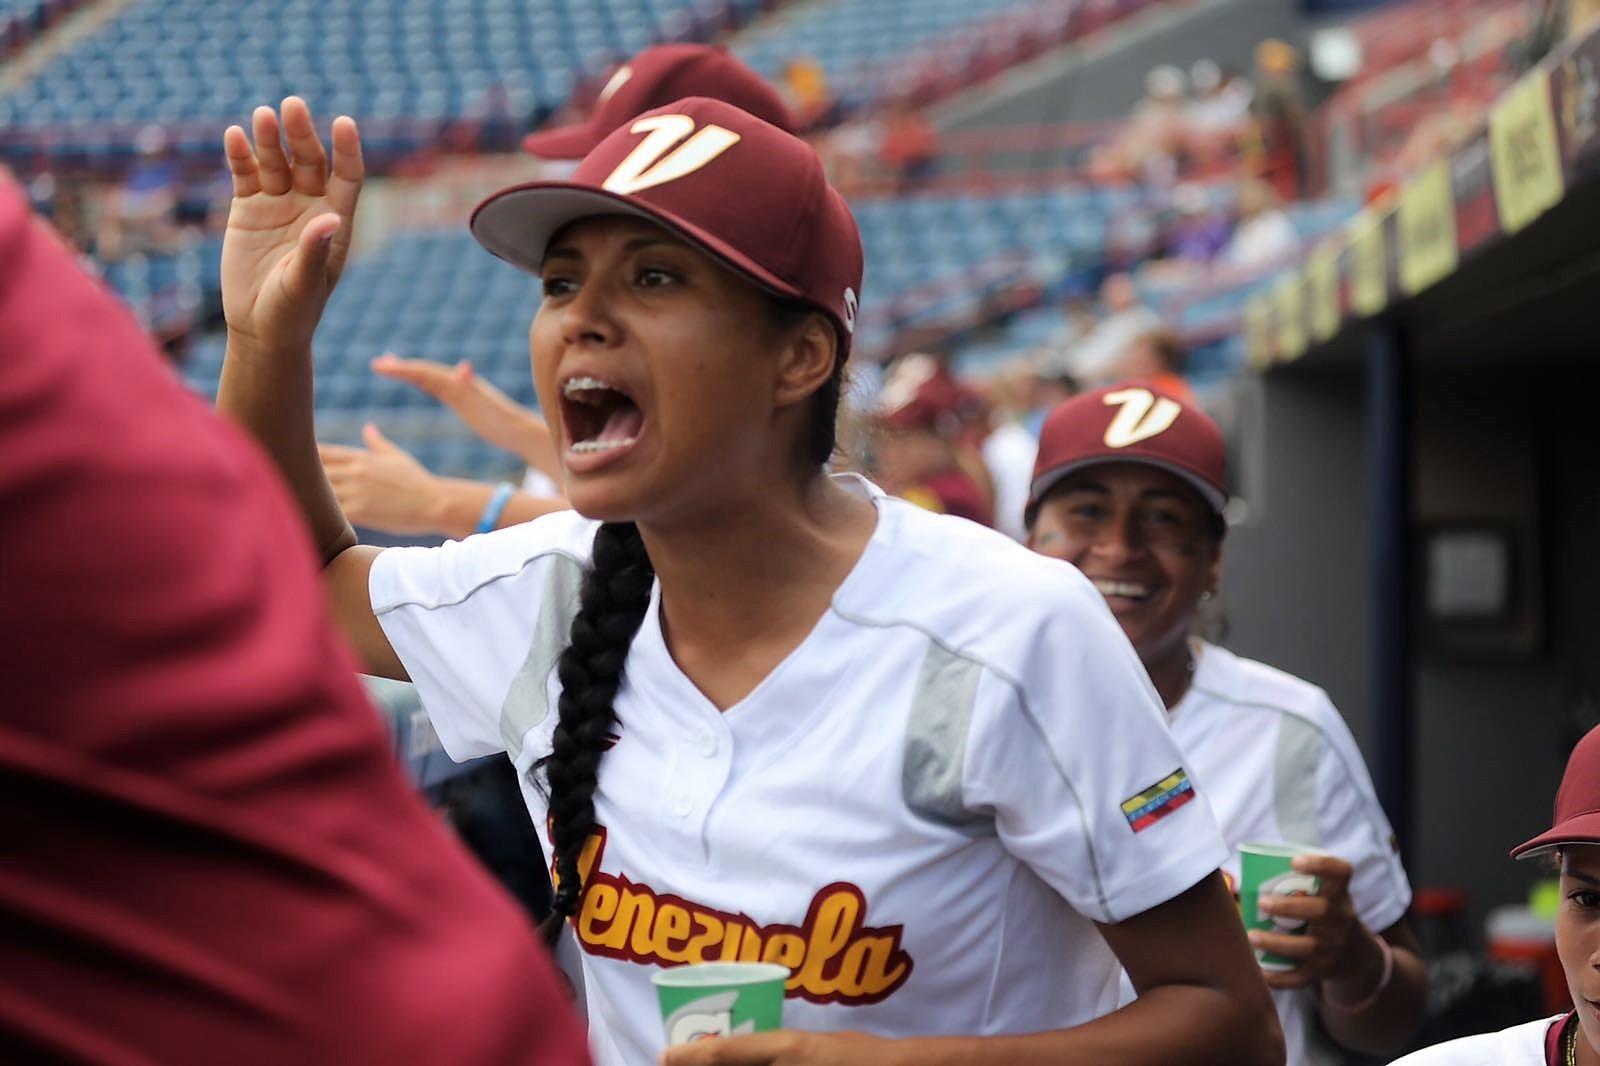 Venezuela: I want to believe